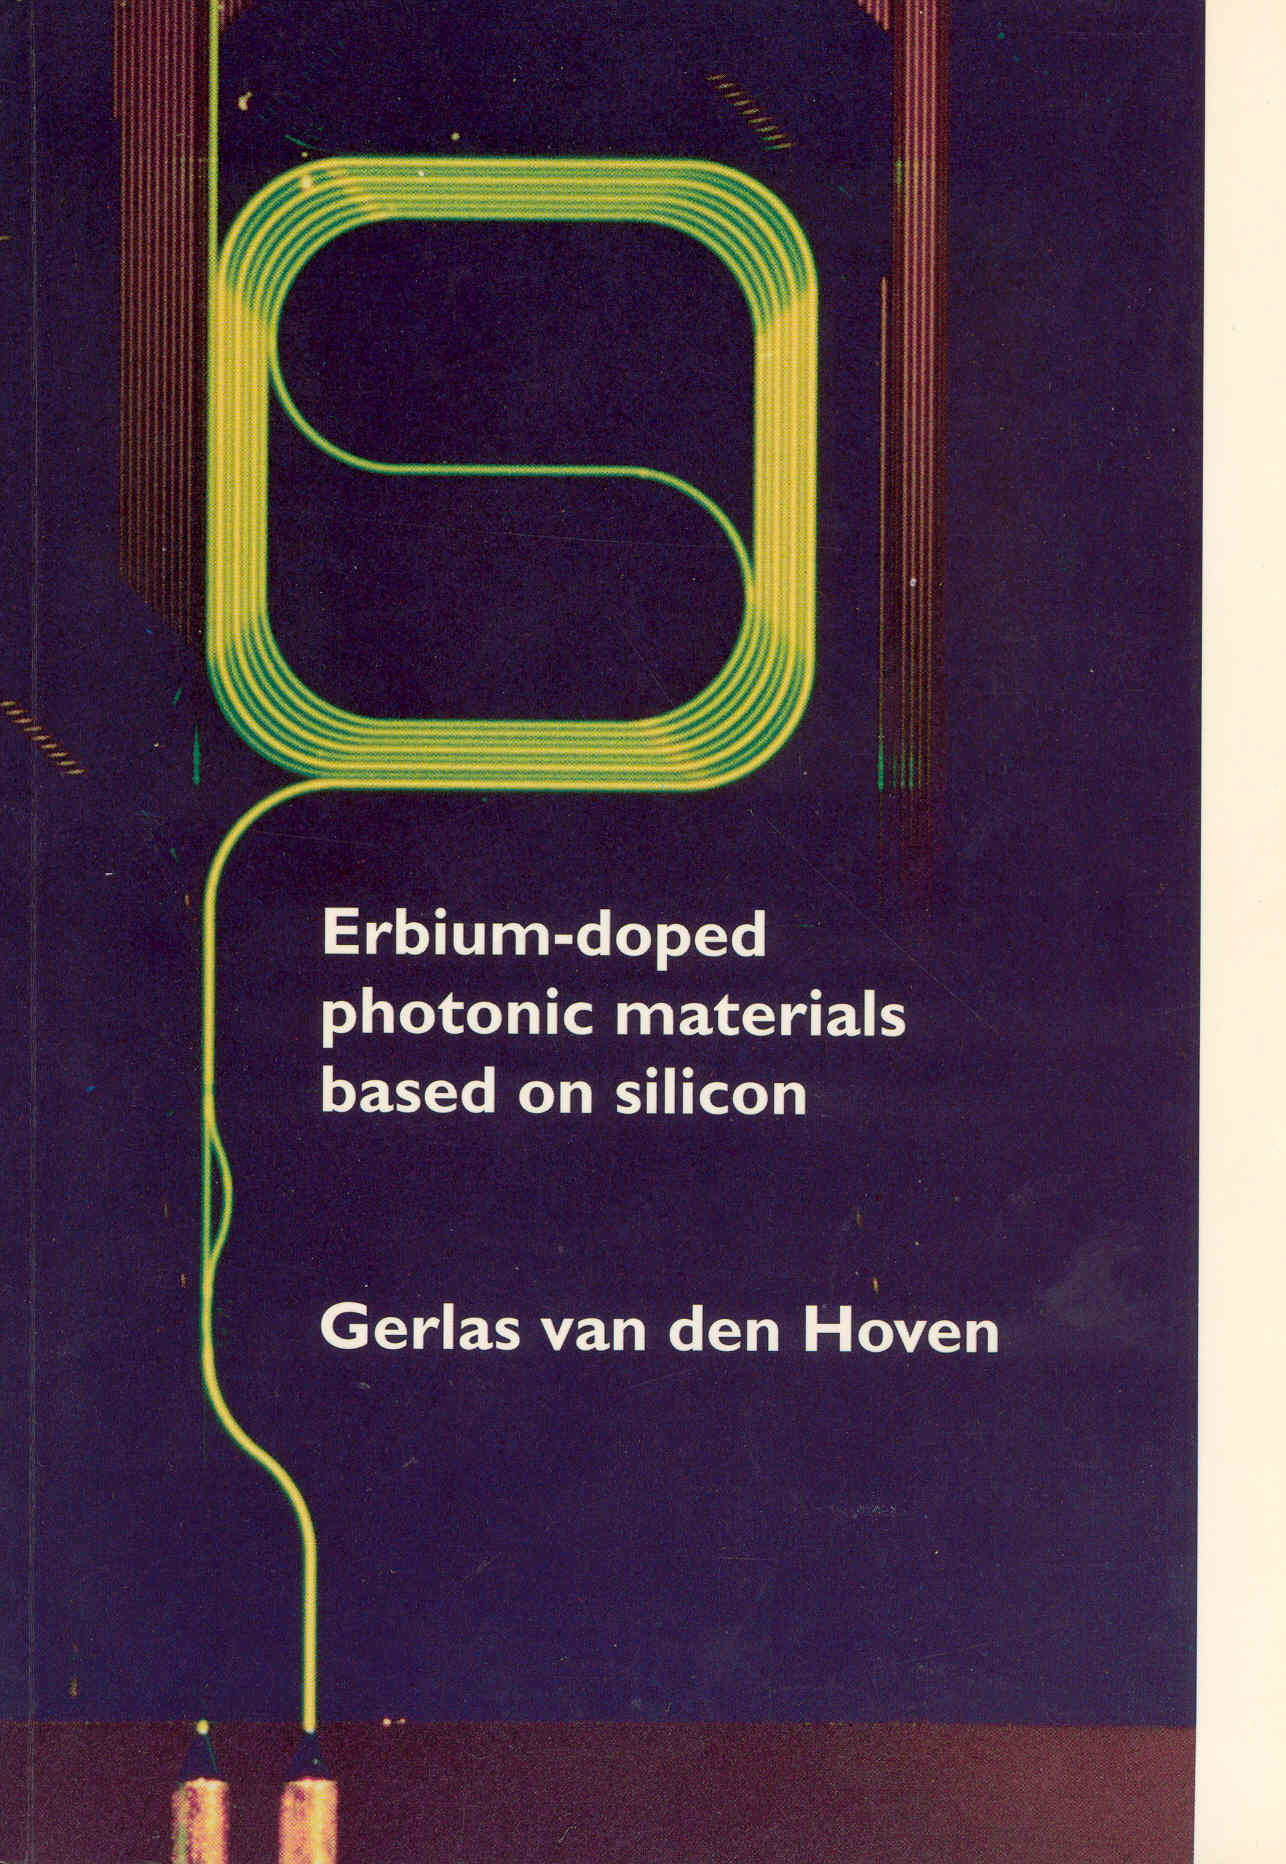 Kippenberg thesis